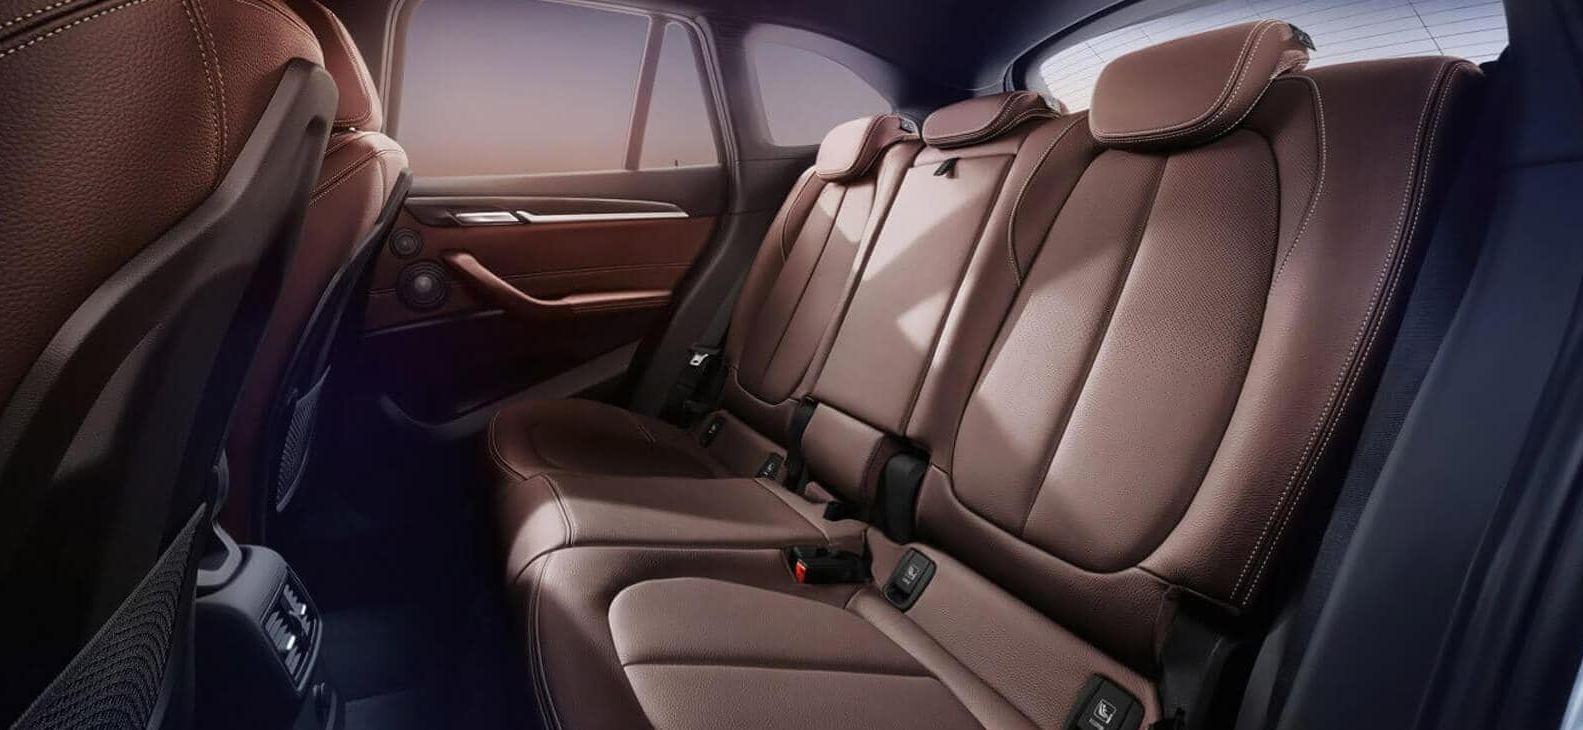 2019 BMW X1 Seating